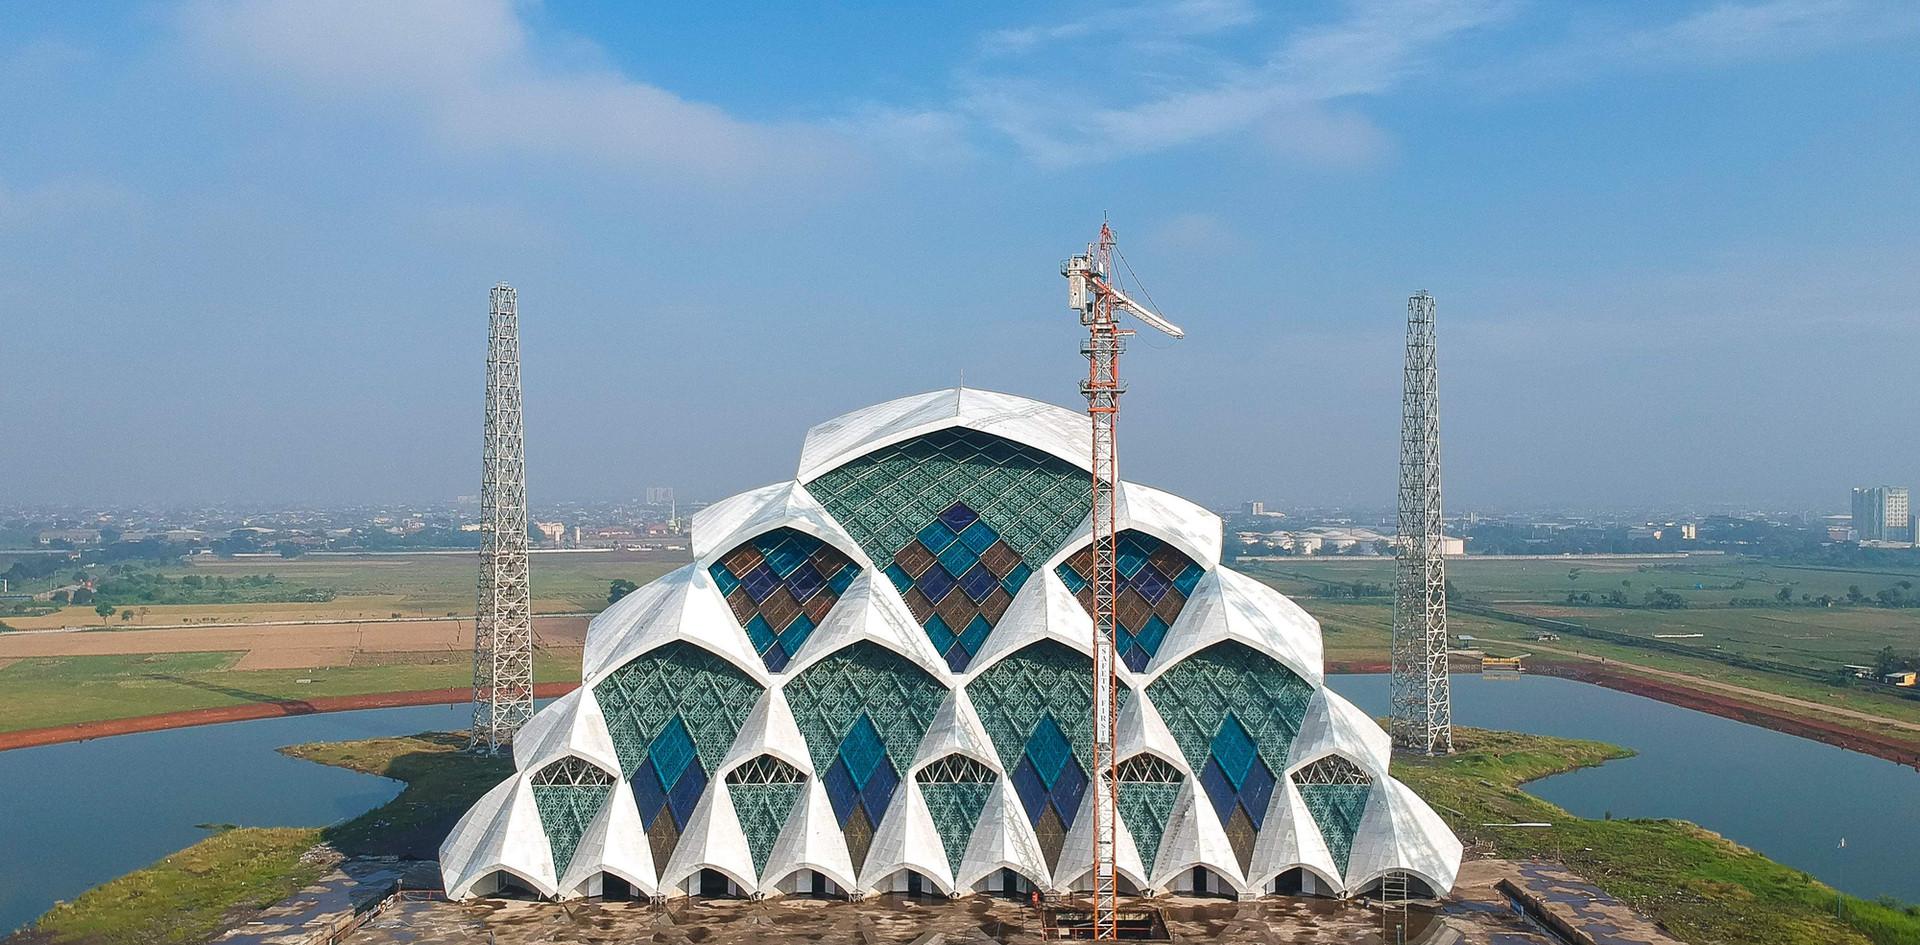 Masjid Raya Al-Jabbar